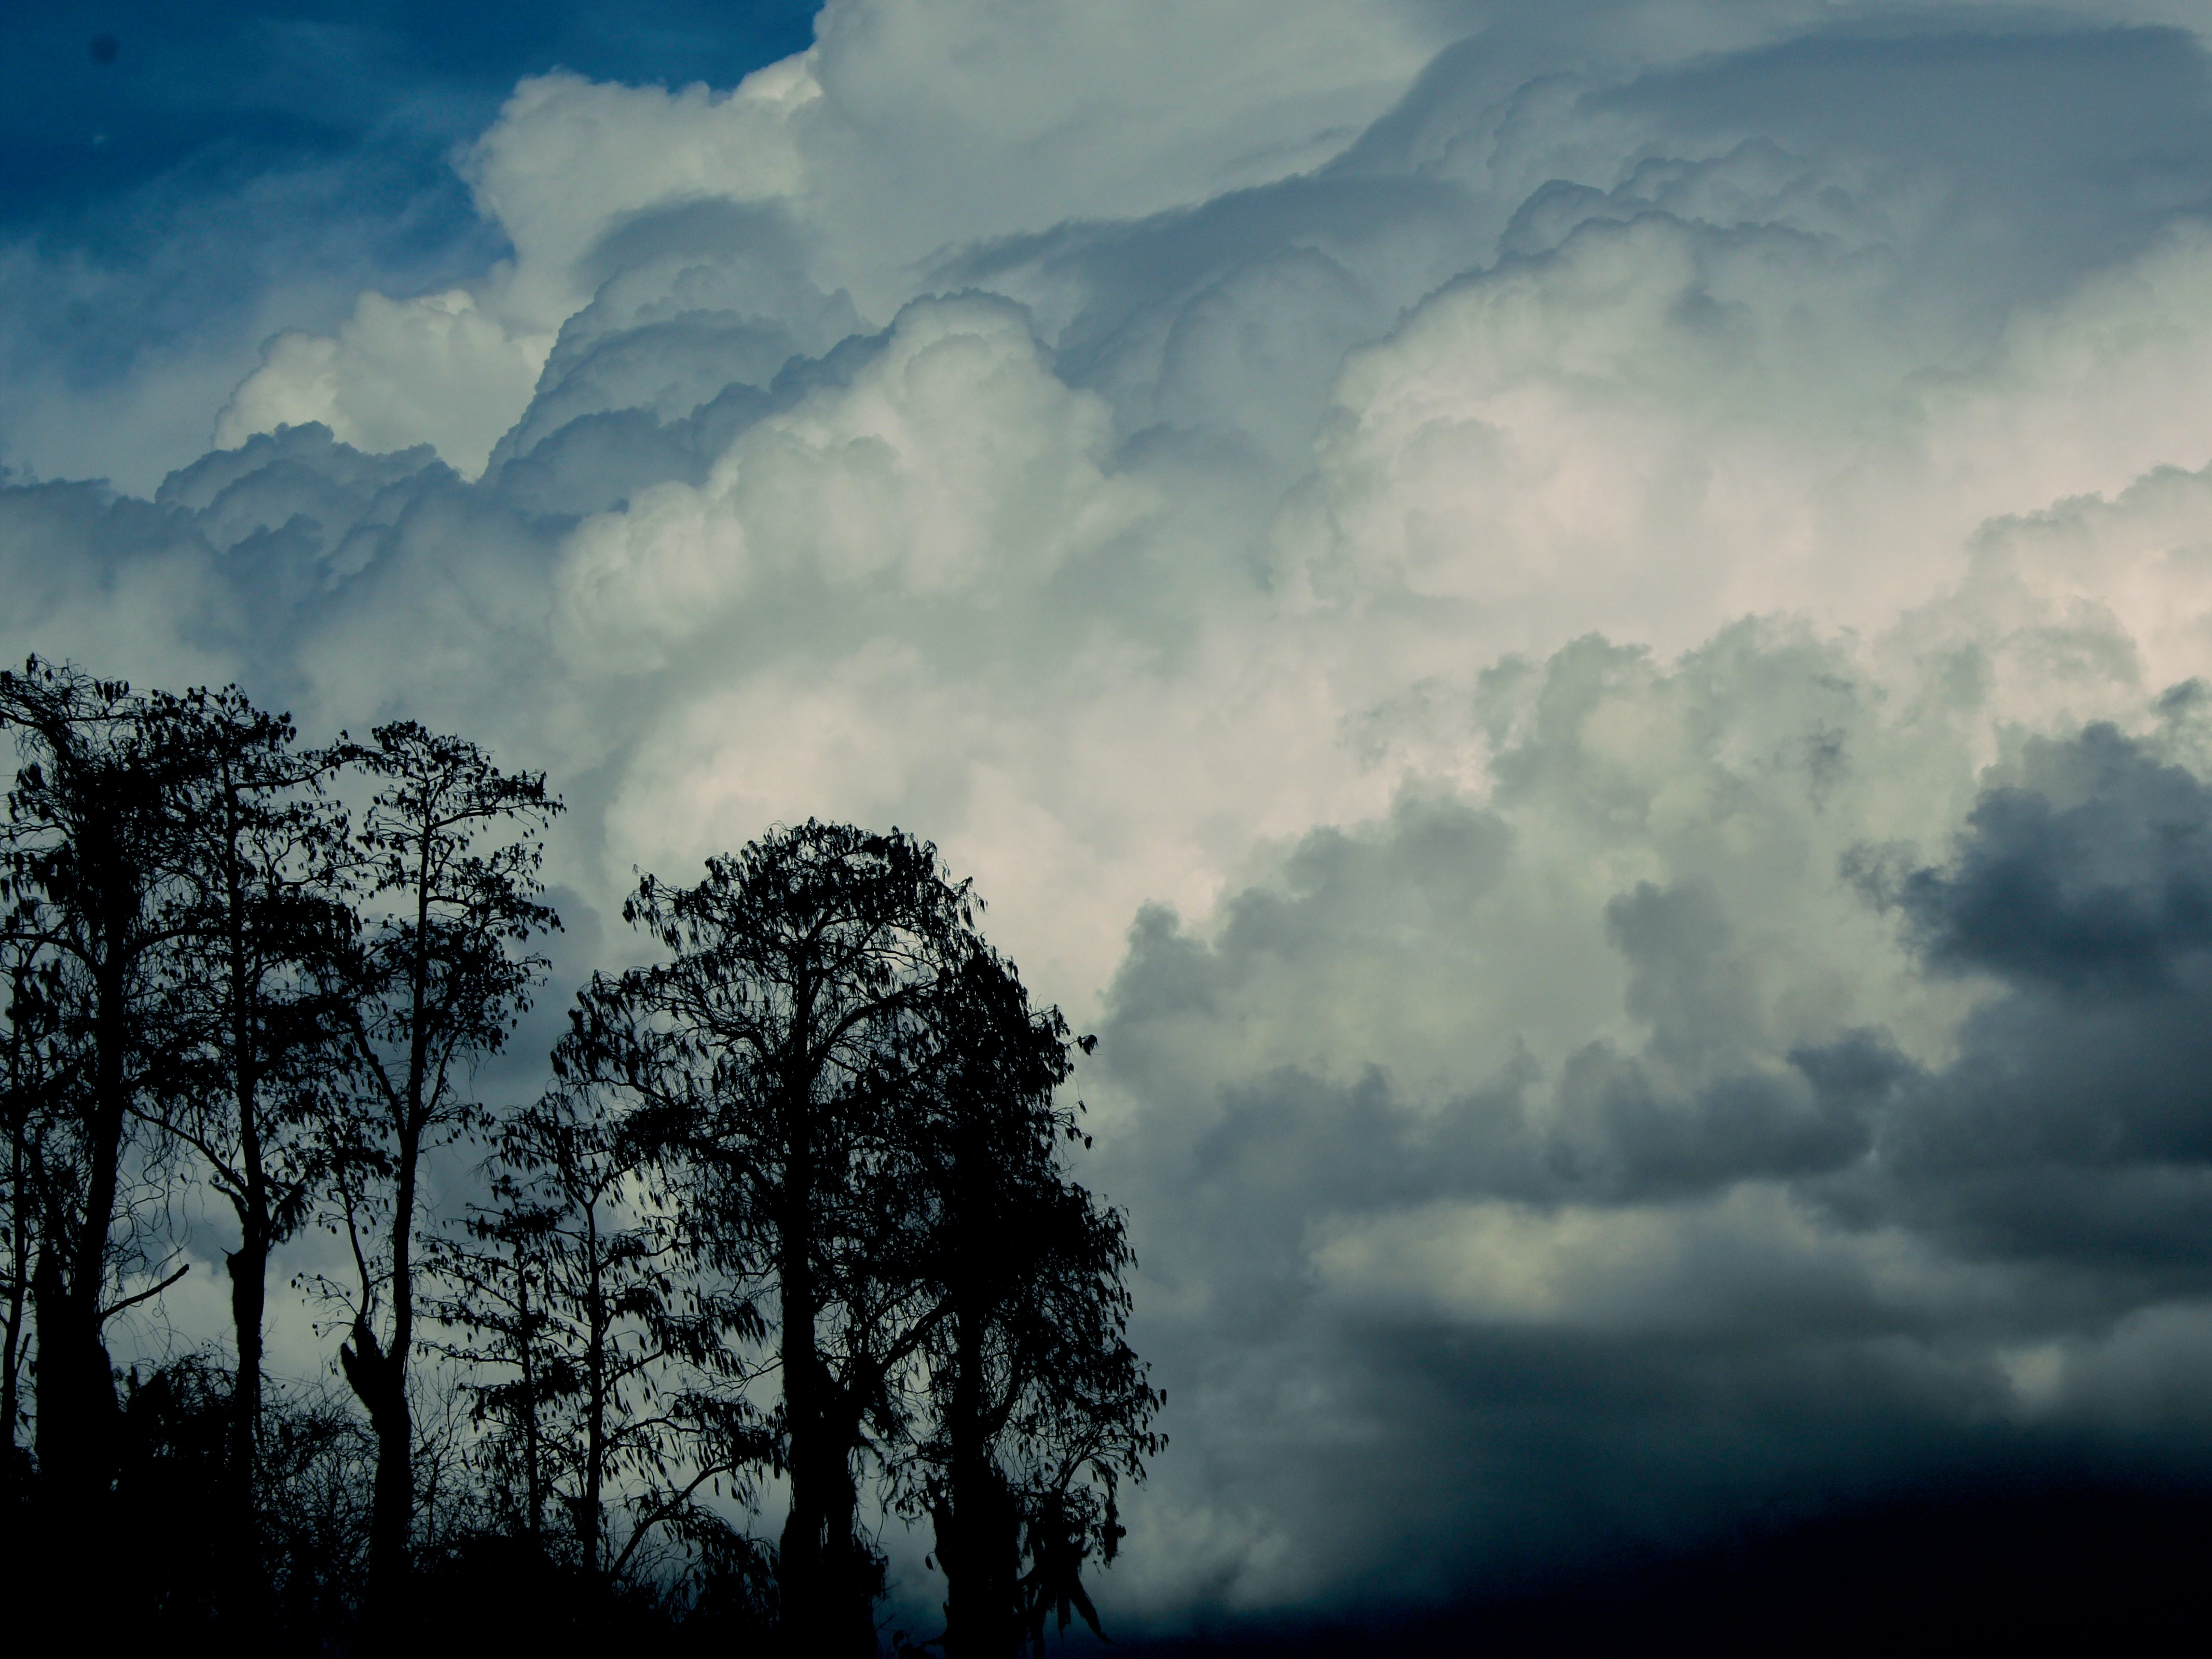 008 (3)color clouds.jpg